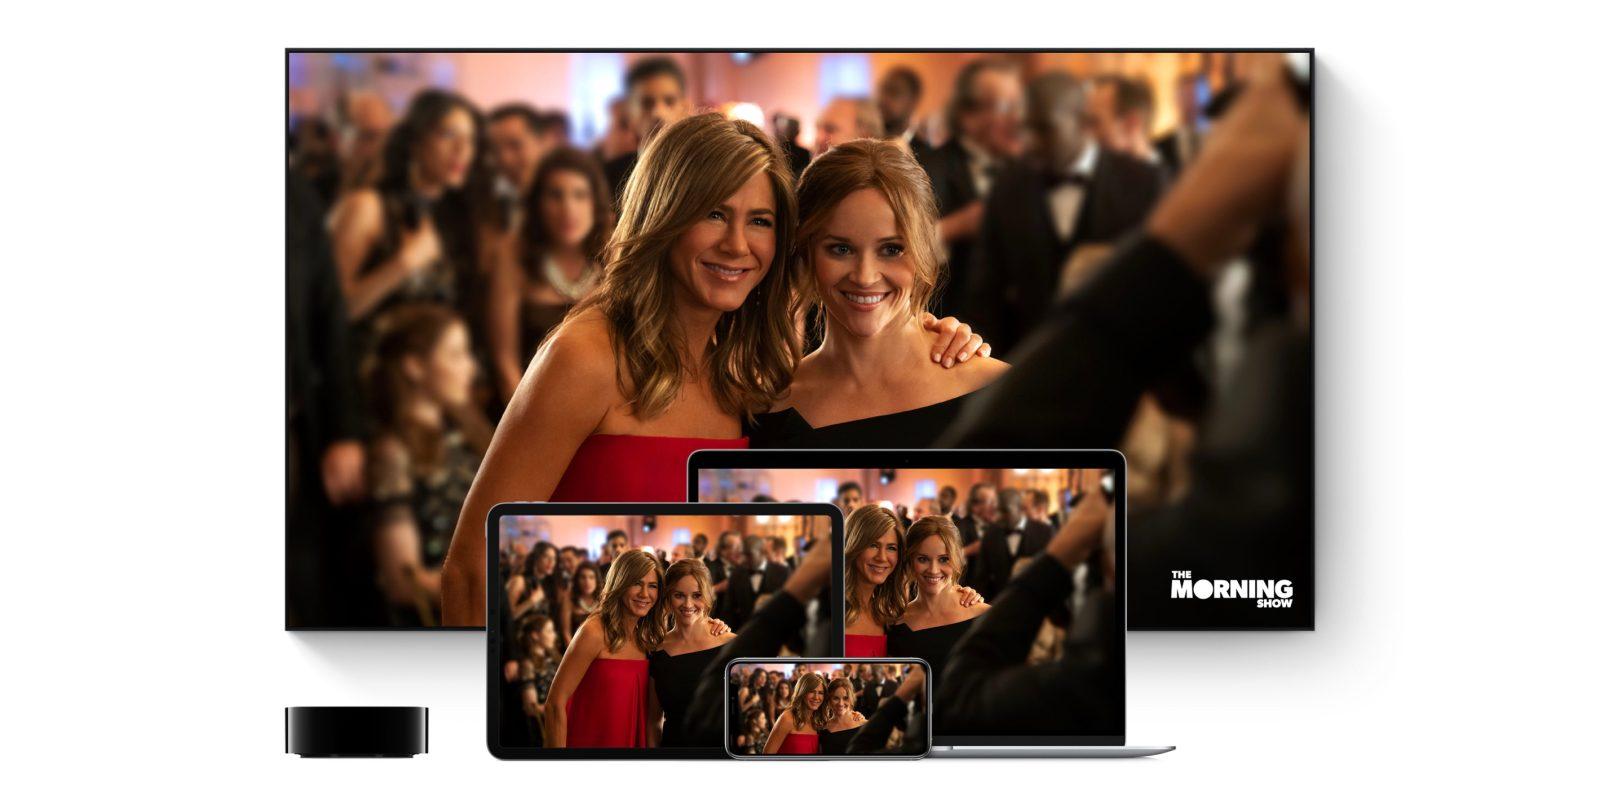 Where To Watch The Apple Tv App Iphone Ipad Mac Roku